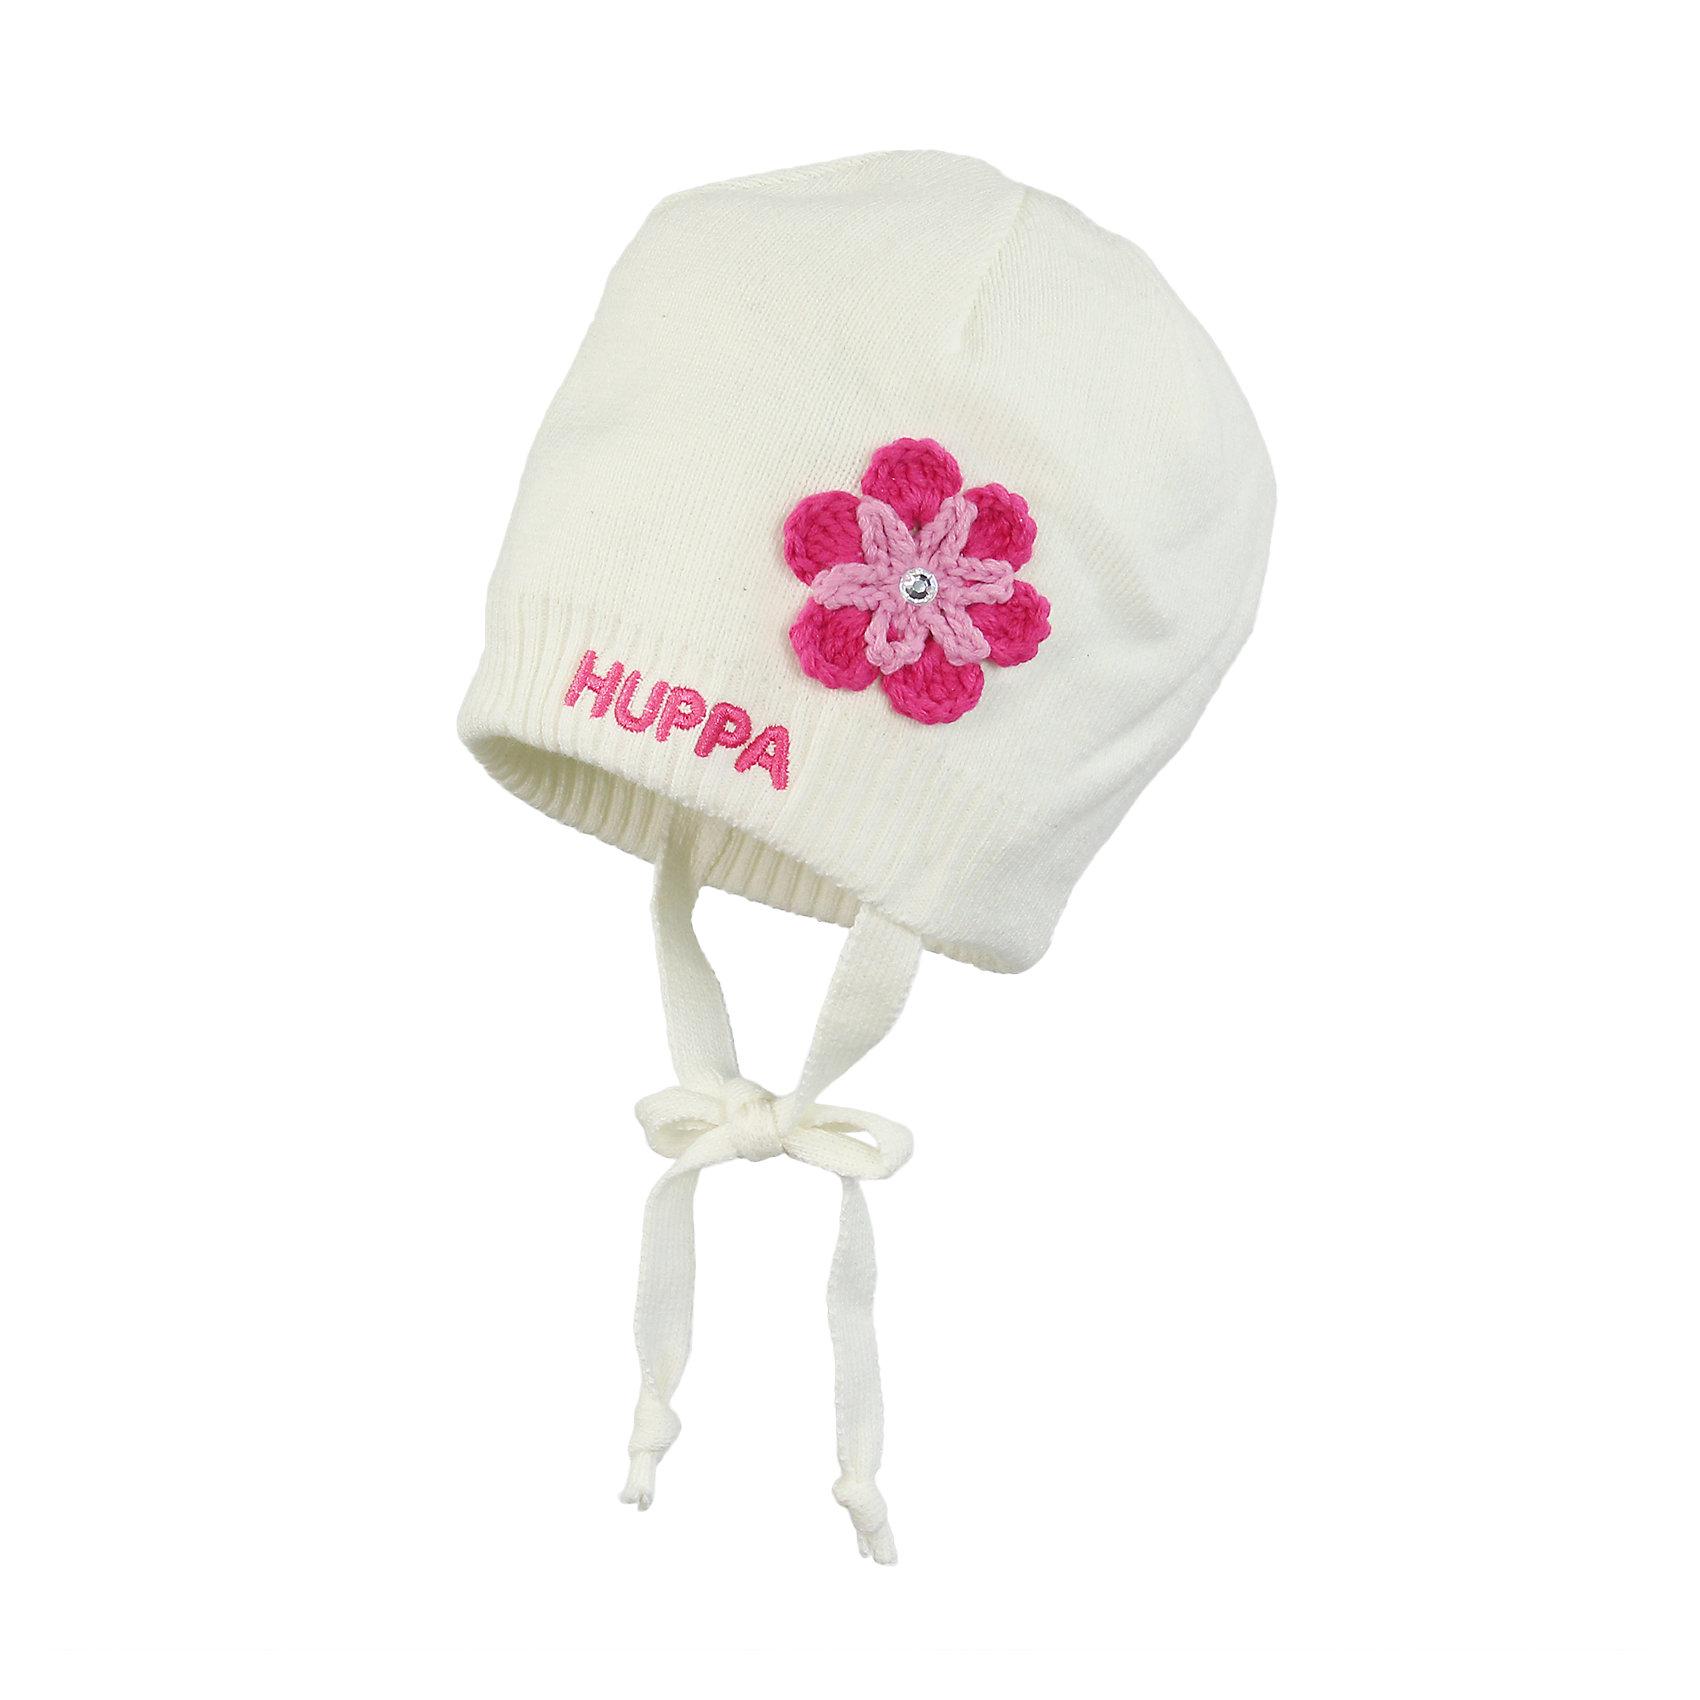 Huppa Шапка для девочки Huppa huppa шапка для девочки huppa